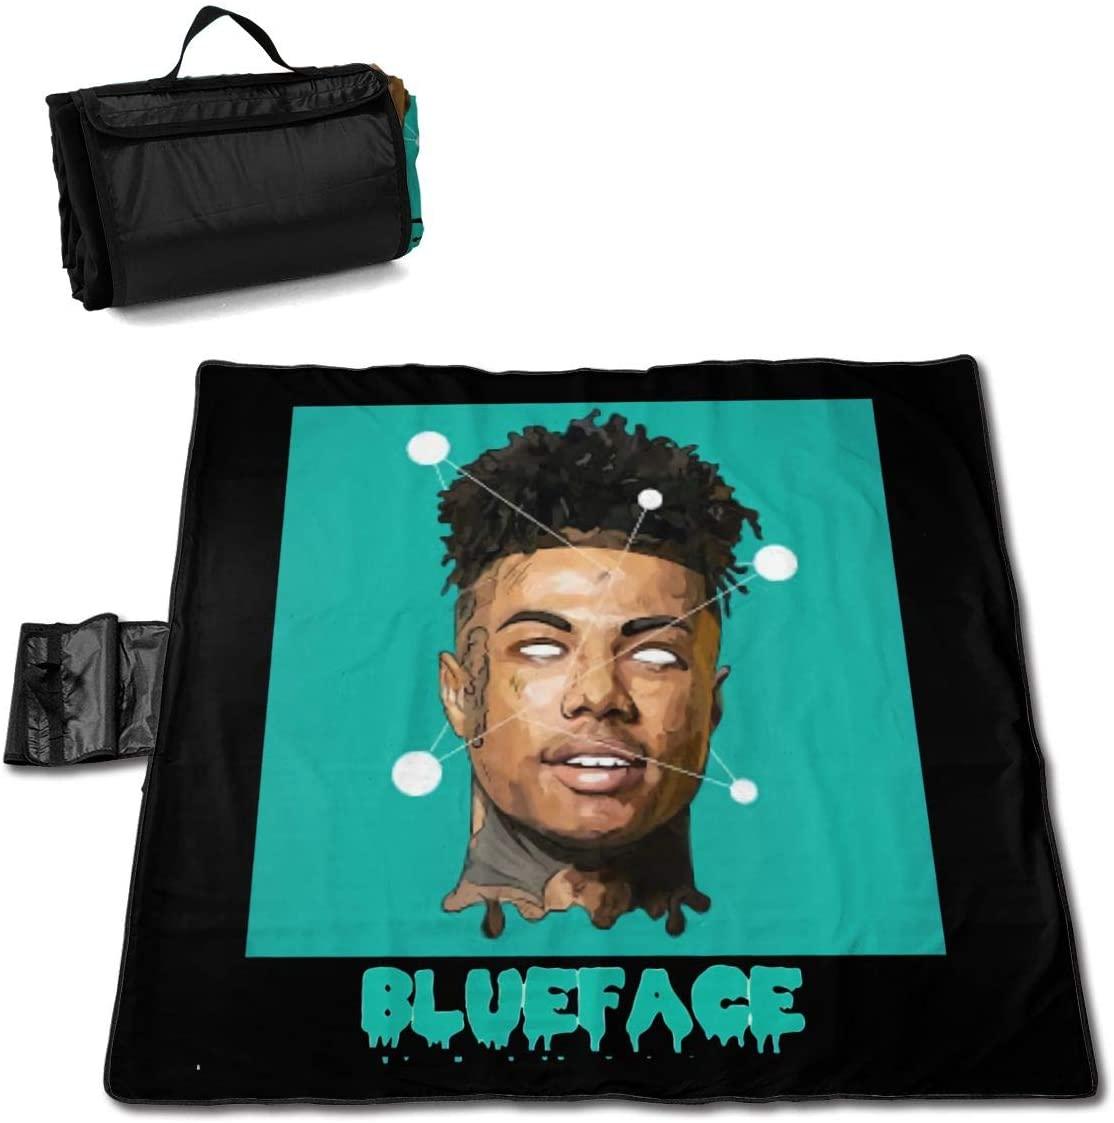 Htu Big Bang Blue=Face Portable Printed Picnic Blanket Waterproof 59x57(in)